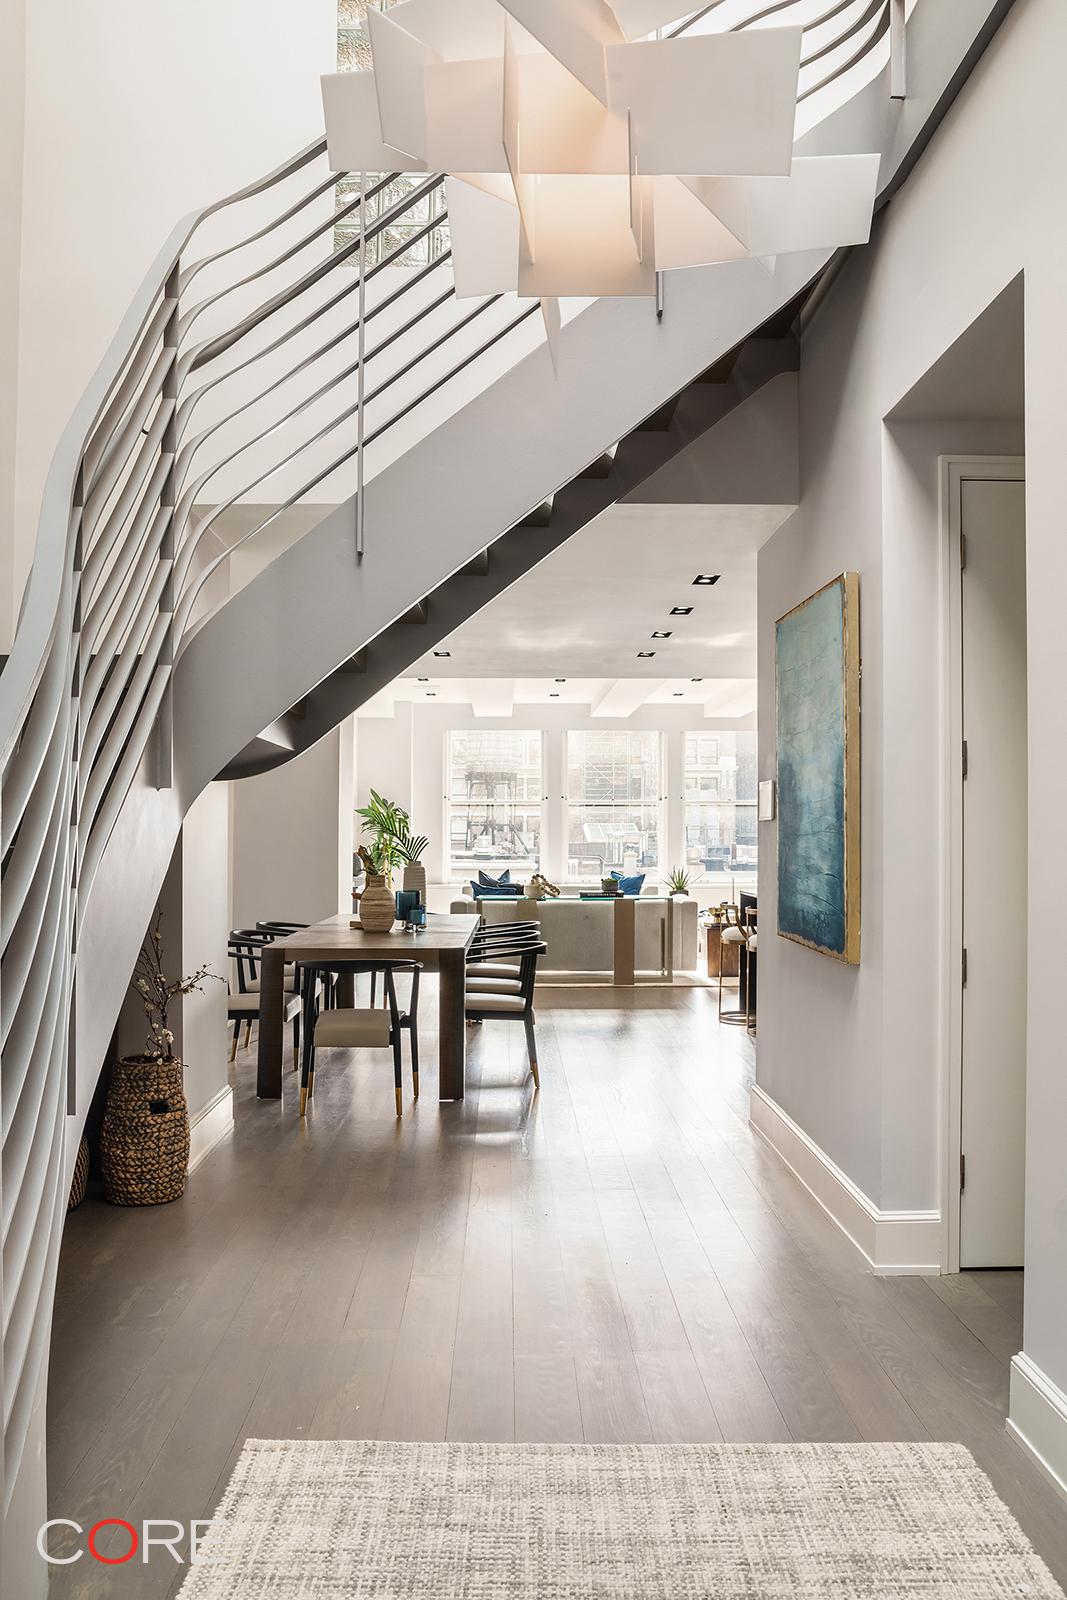 Apartment for sale at 260 Park Avenue South, Apt PHJ